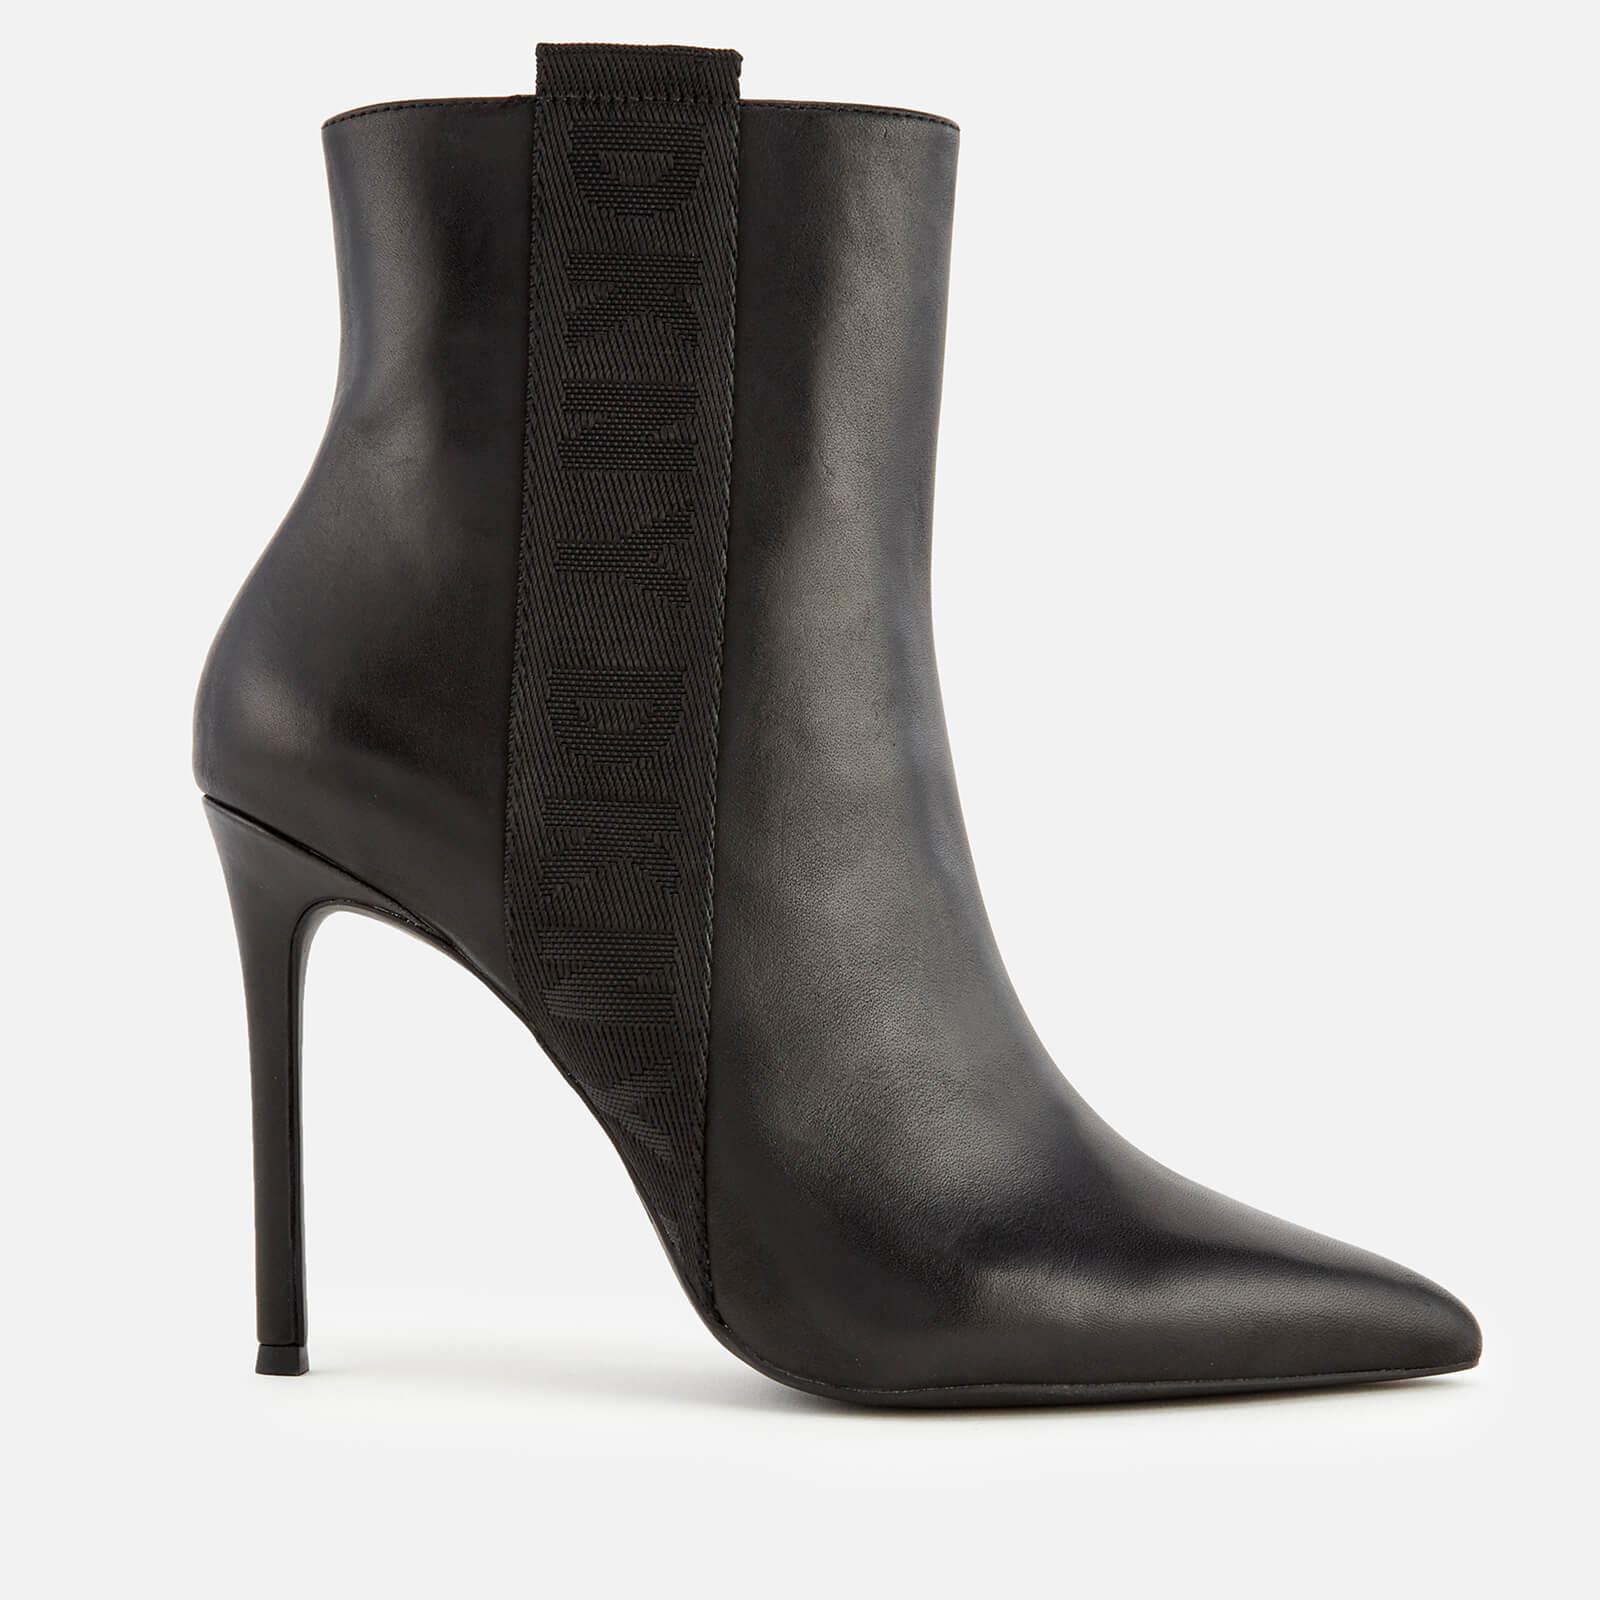 5157a46d1 DKNY Women's Ranita Heeled Shoe Boots - Black | FREE UK Delivery | Allsole